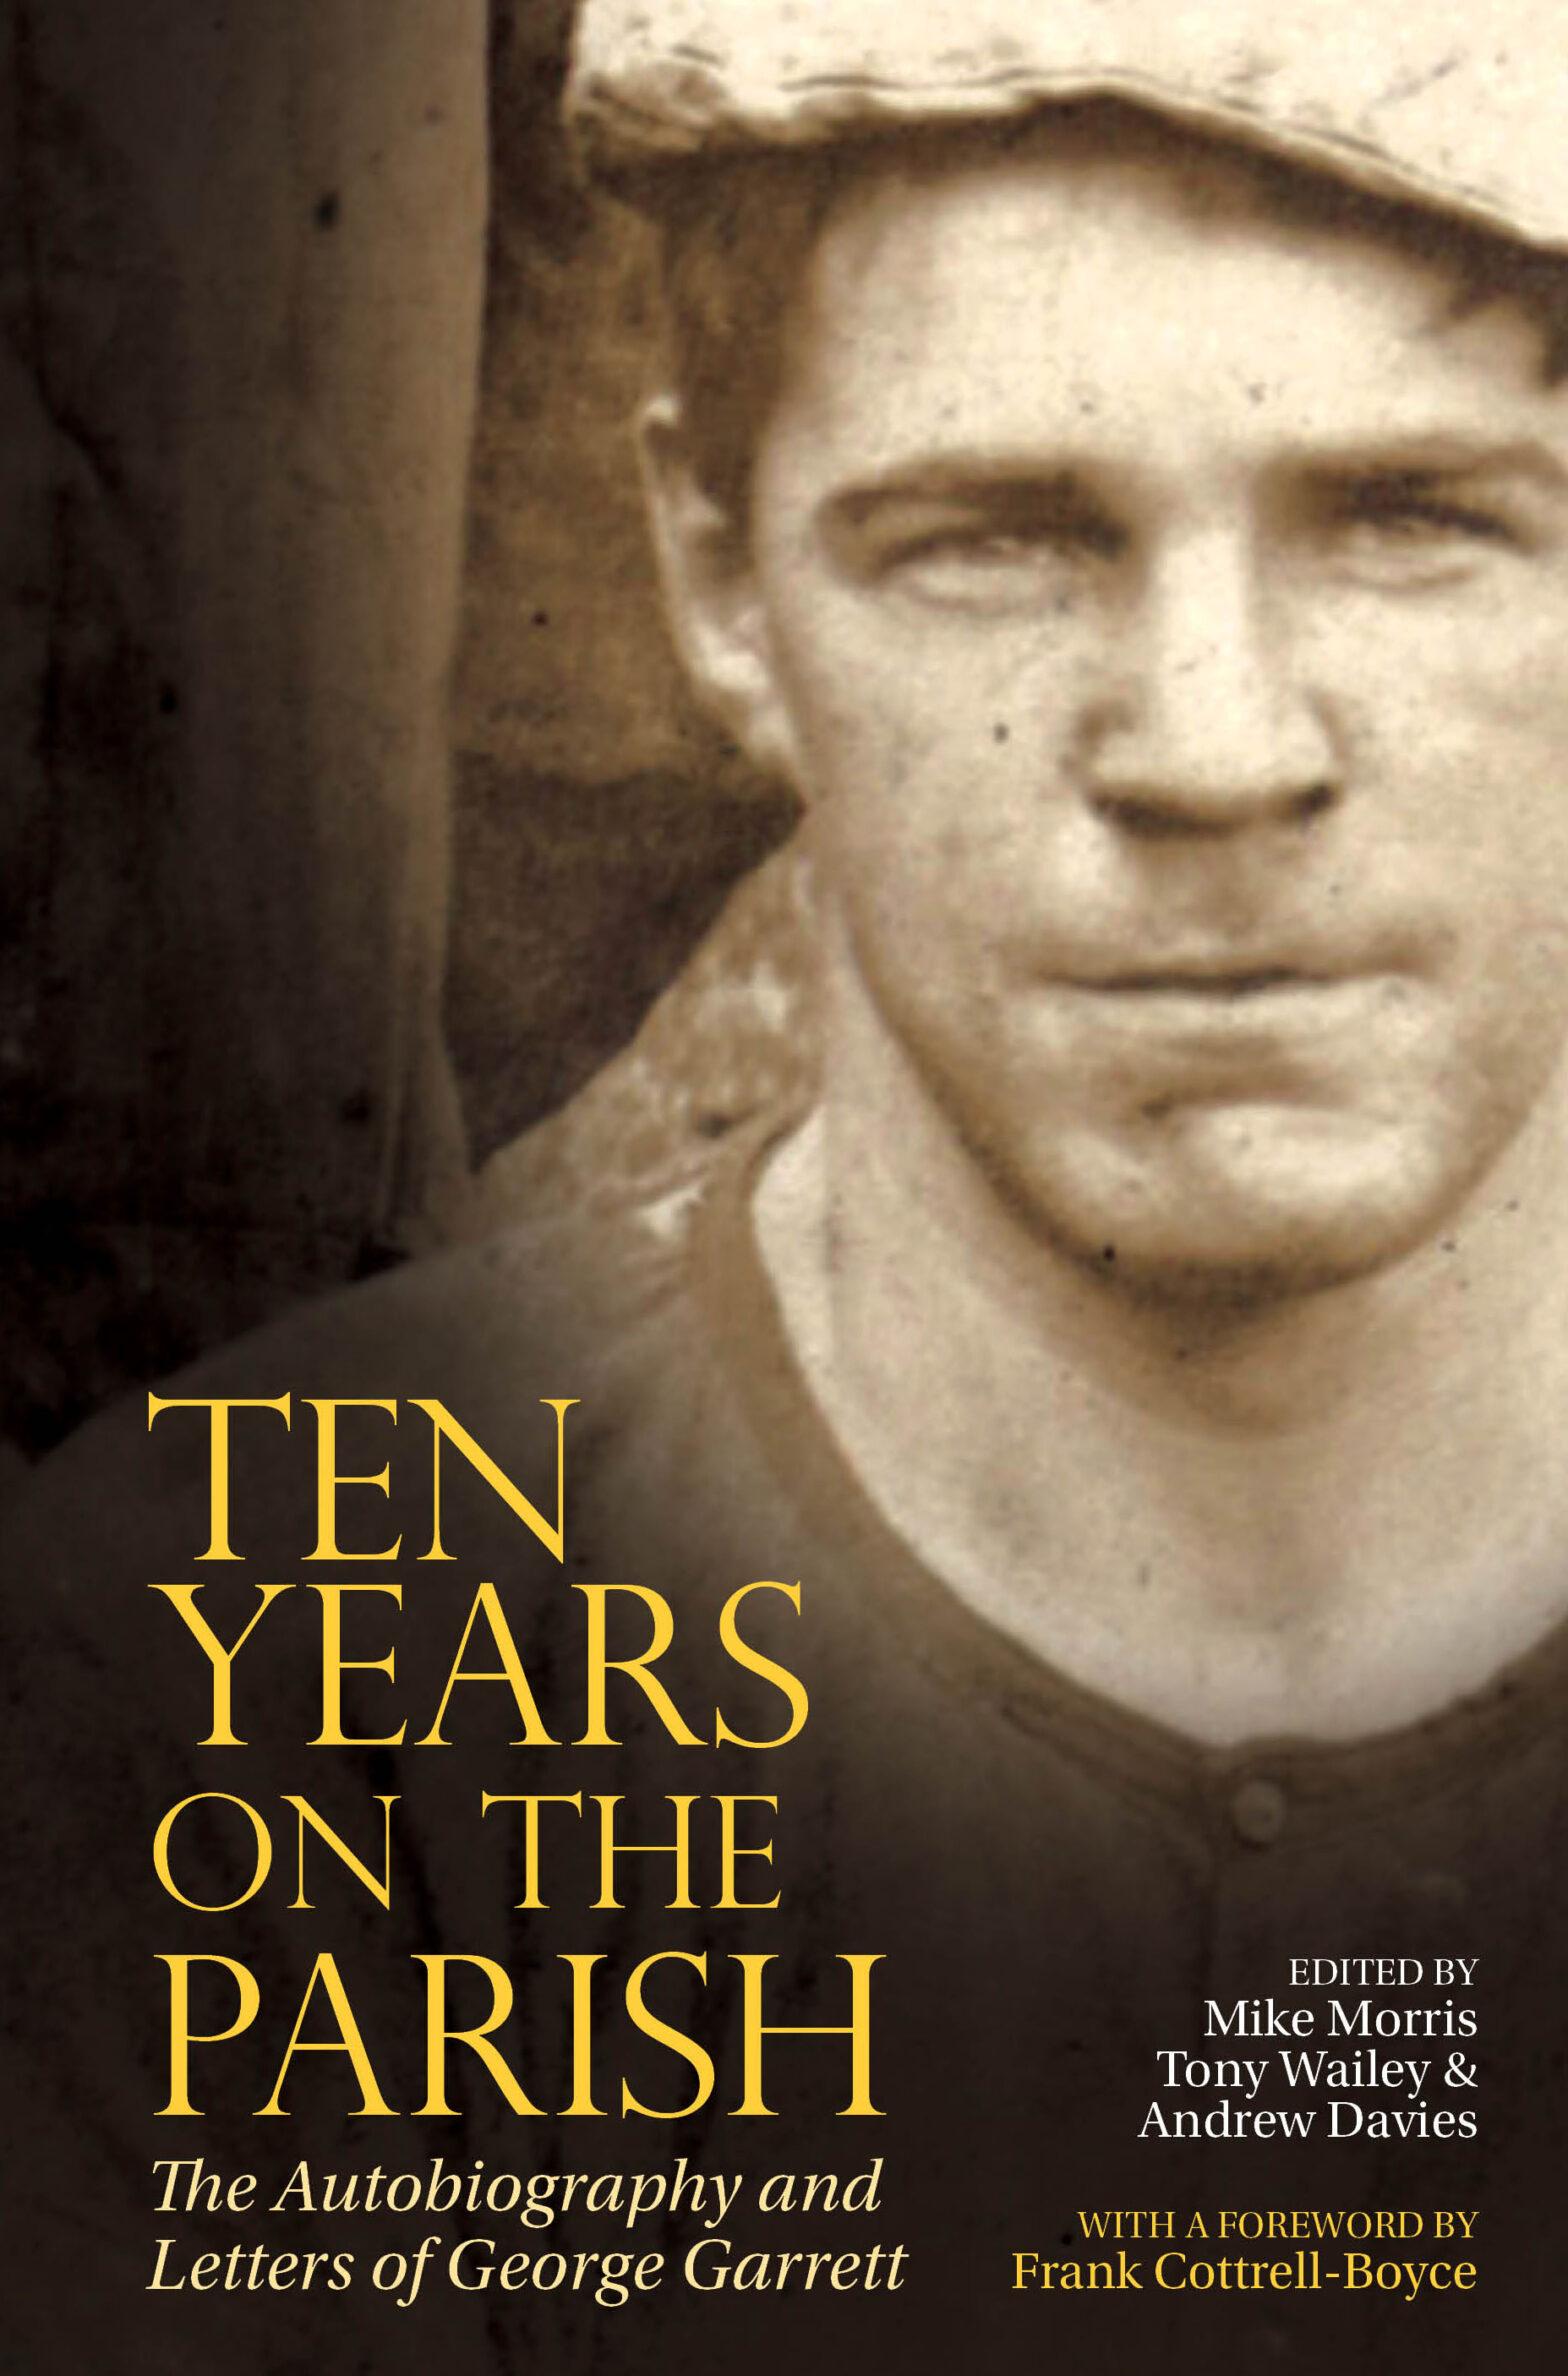 Ten Years On The Parish by George Garrett